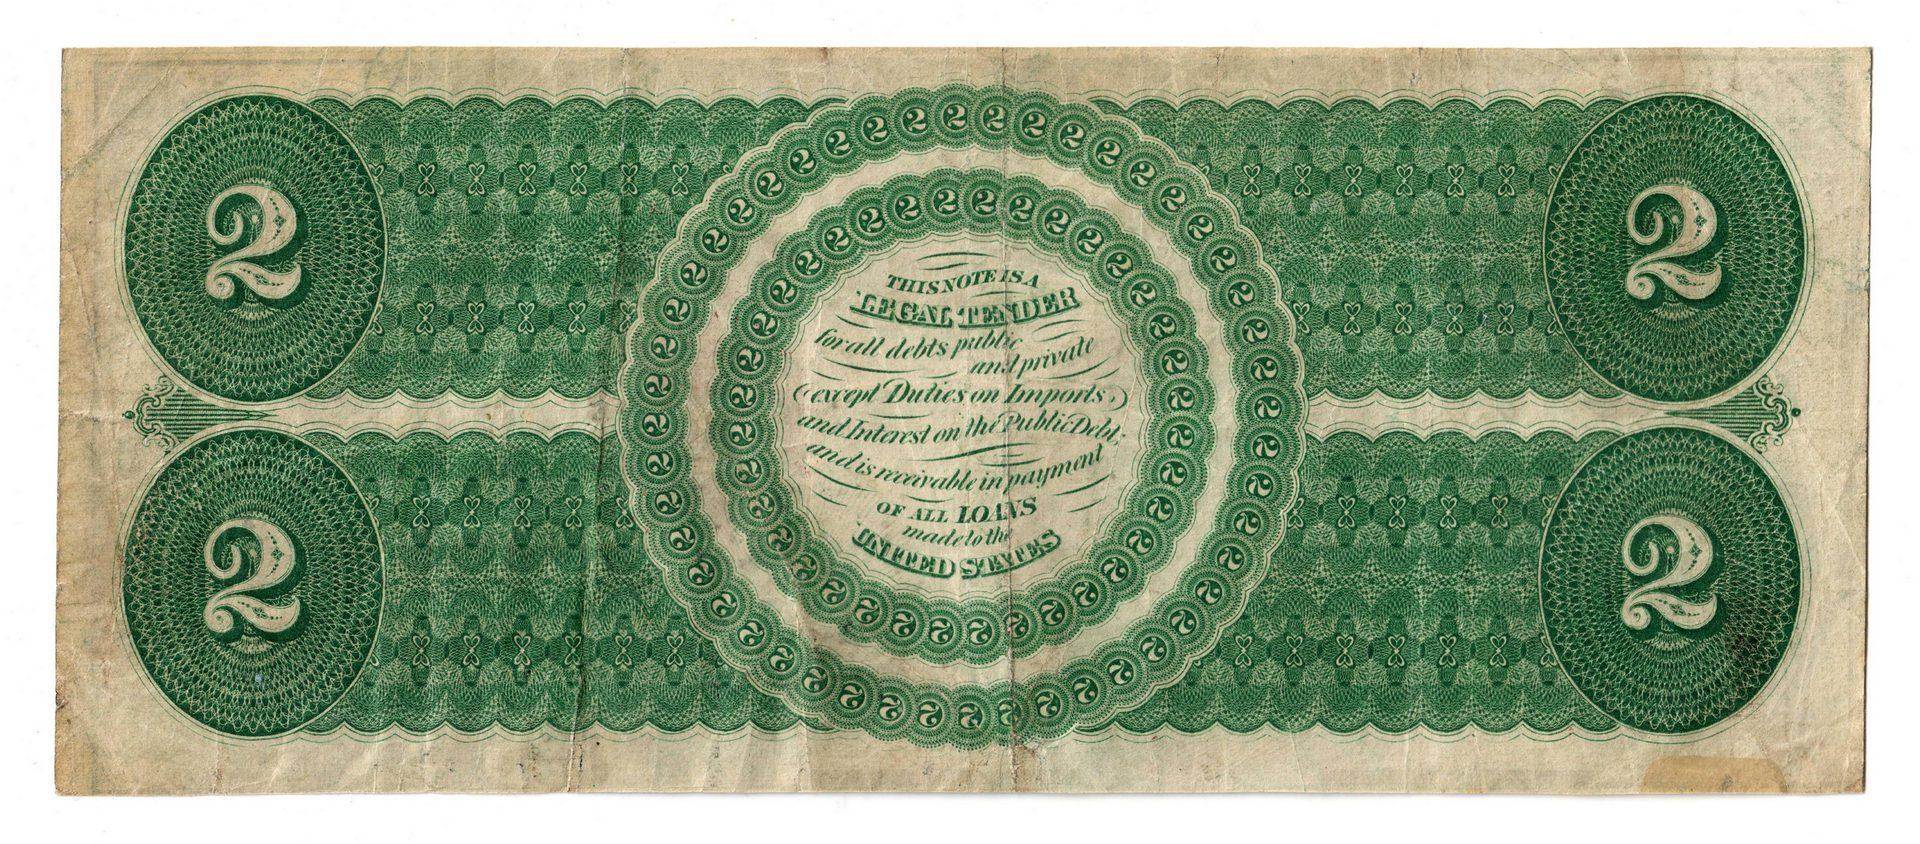 Lot 21: 1862 U.S. $2 Legal Tender Note